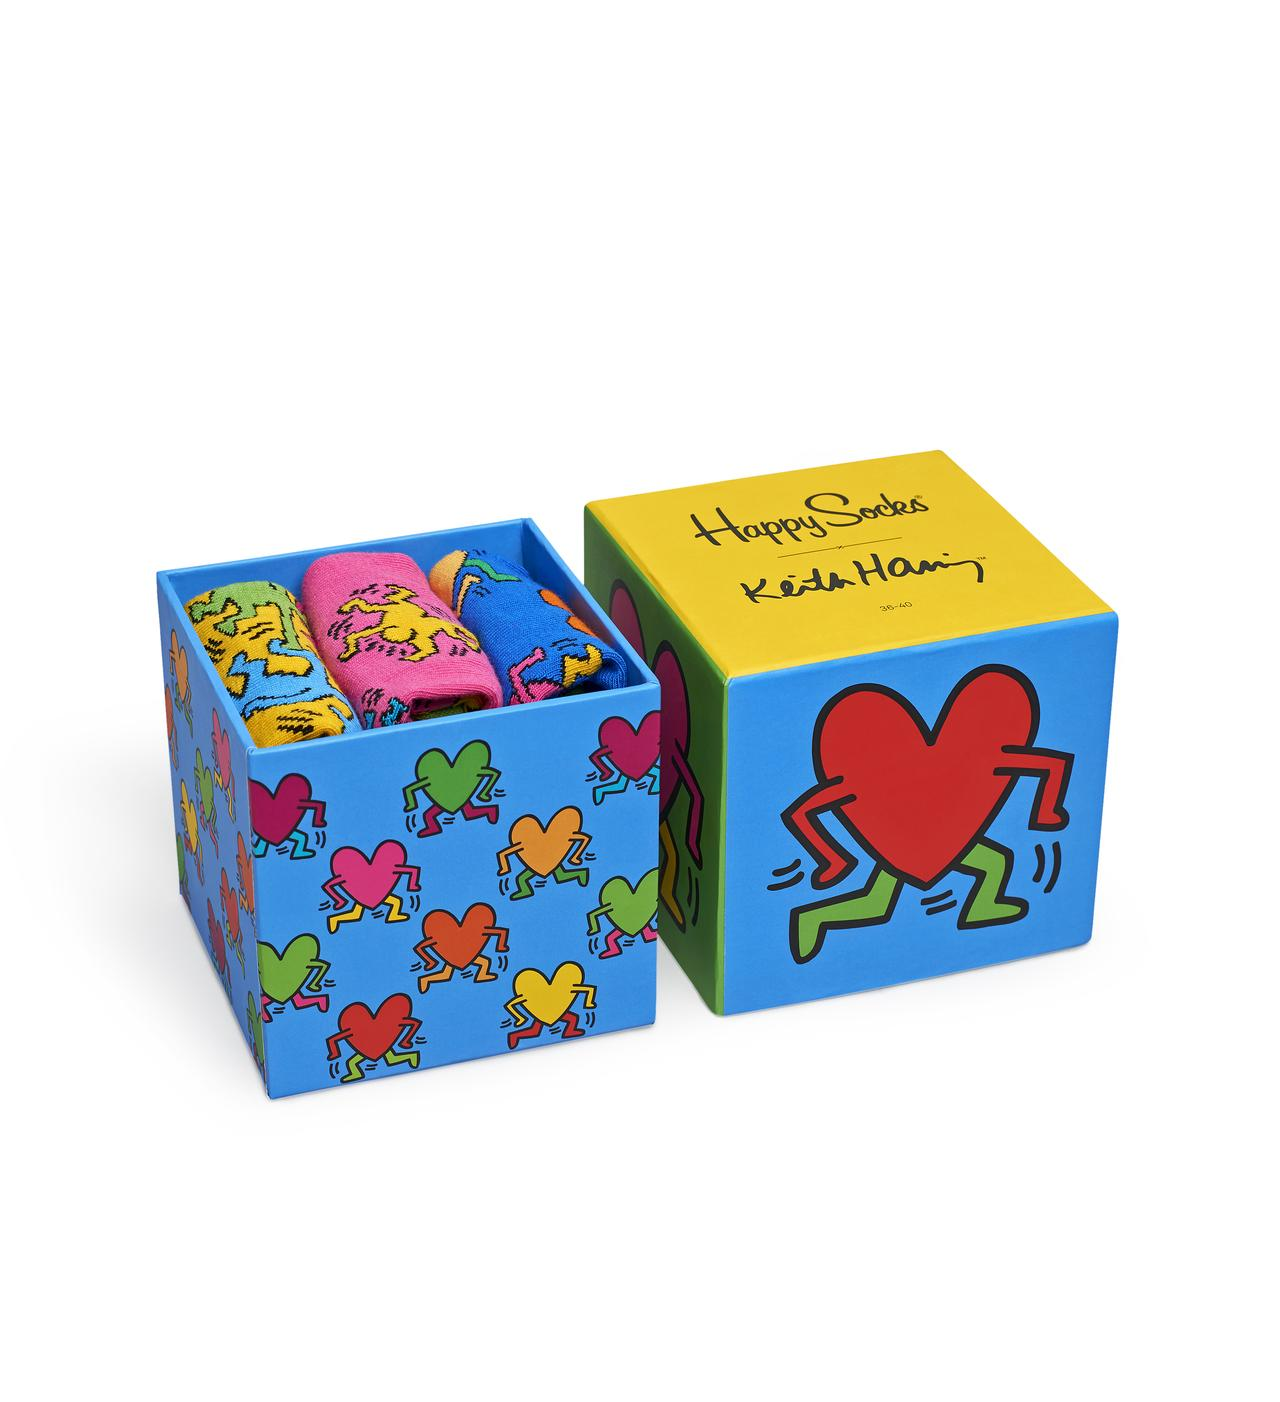 画像: Box Set (3Packs) 4,000円(税抜)